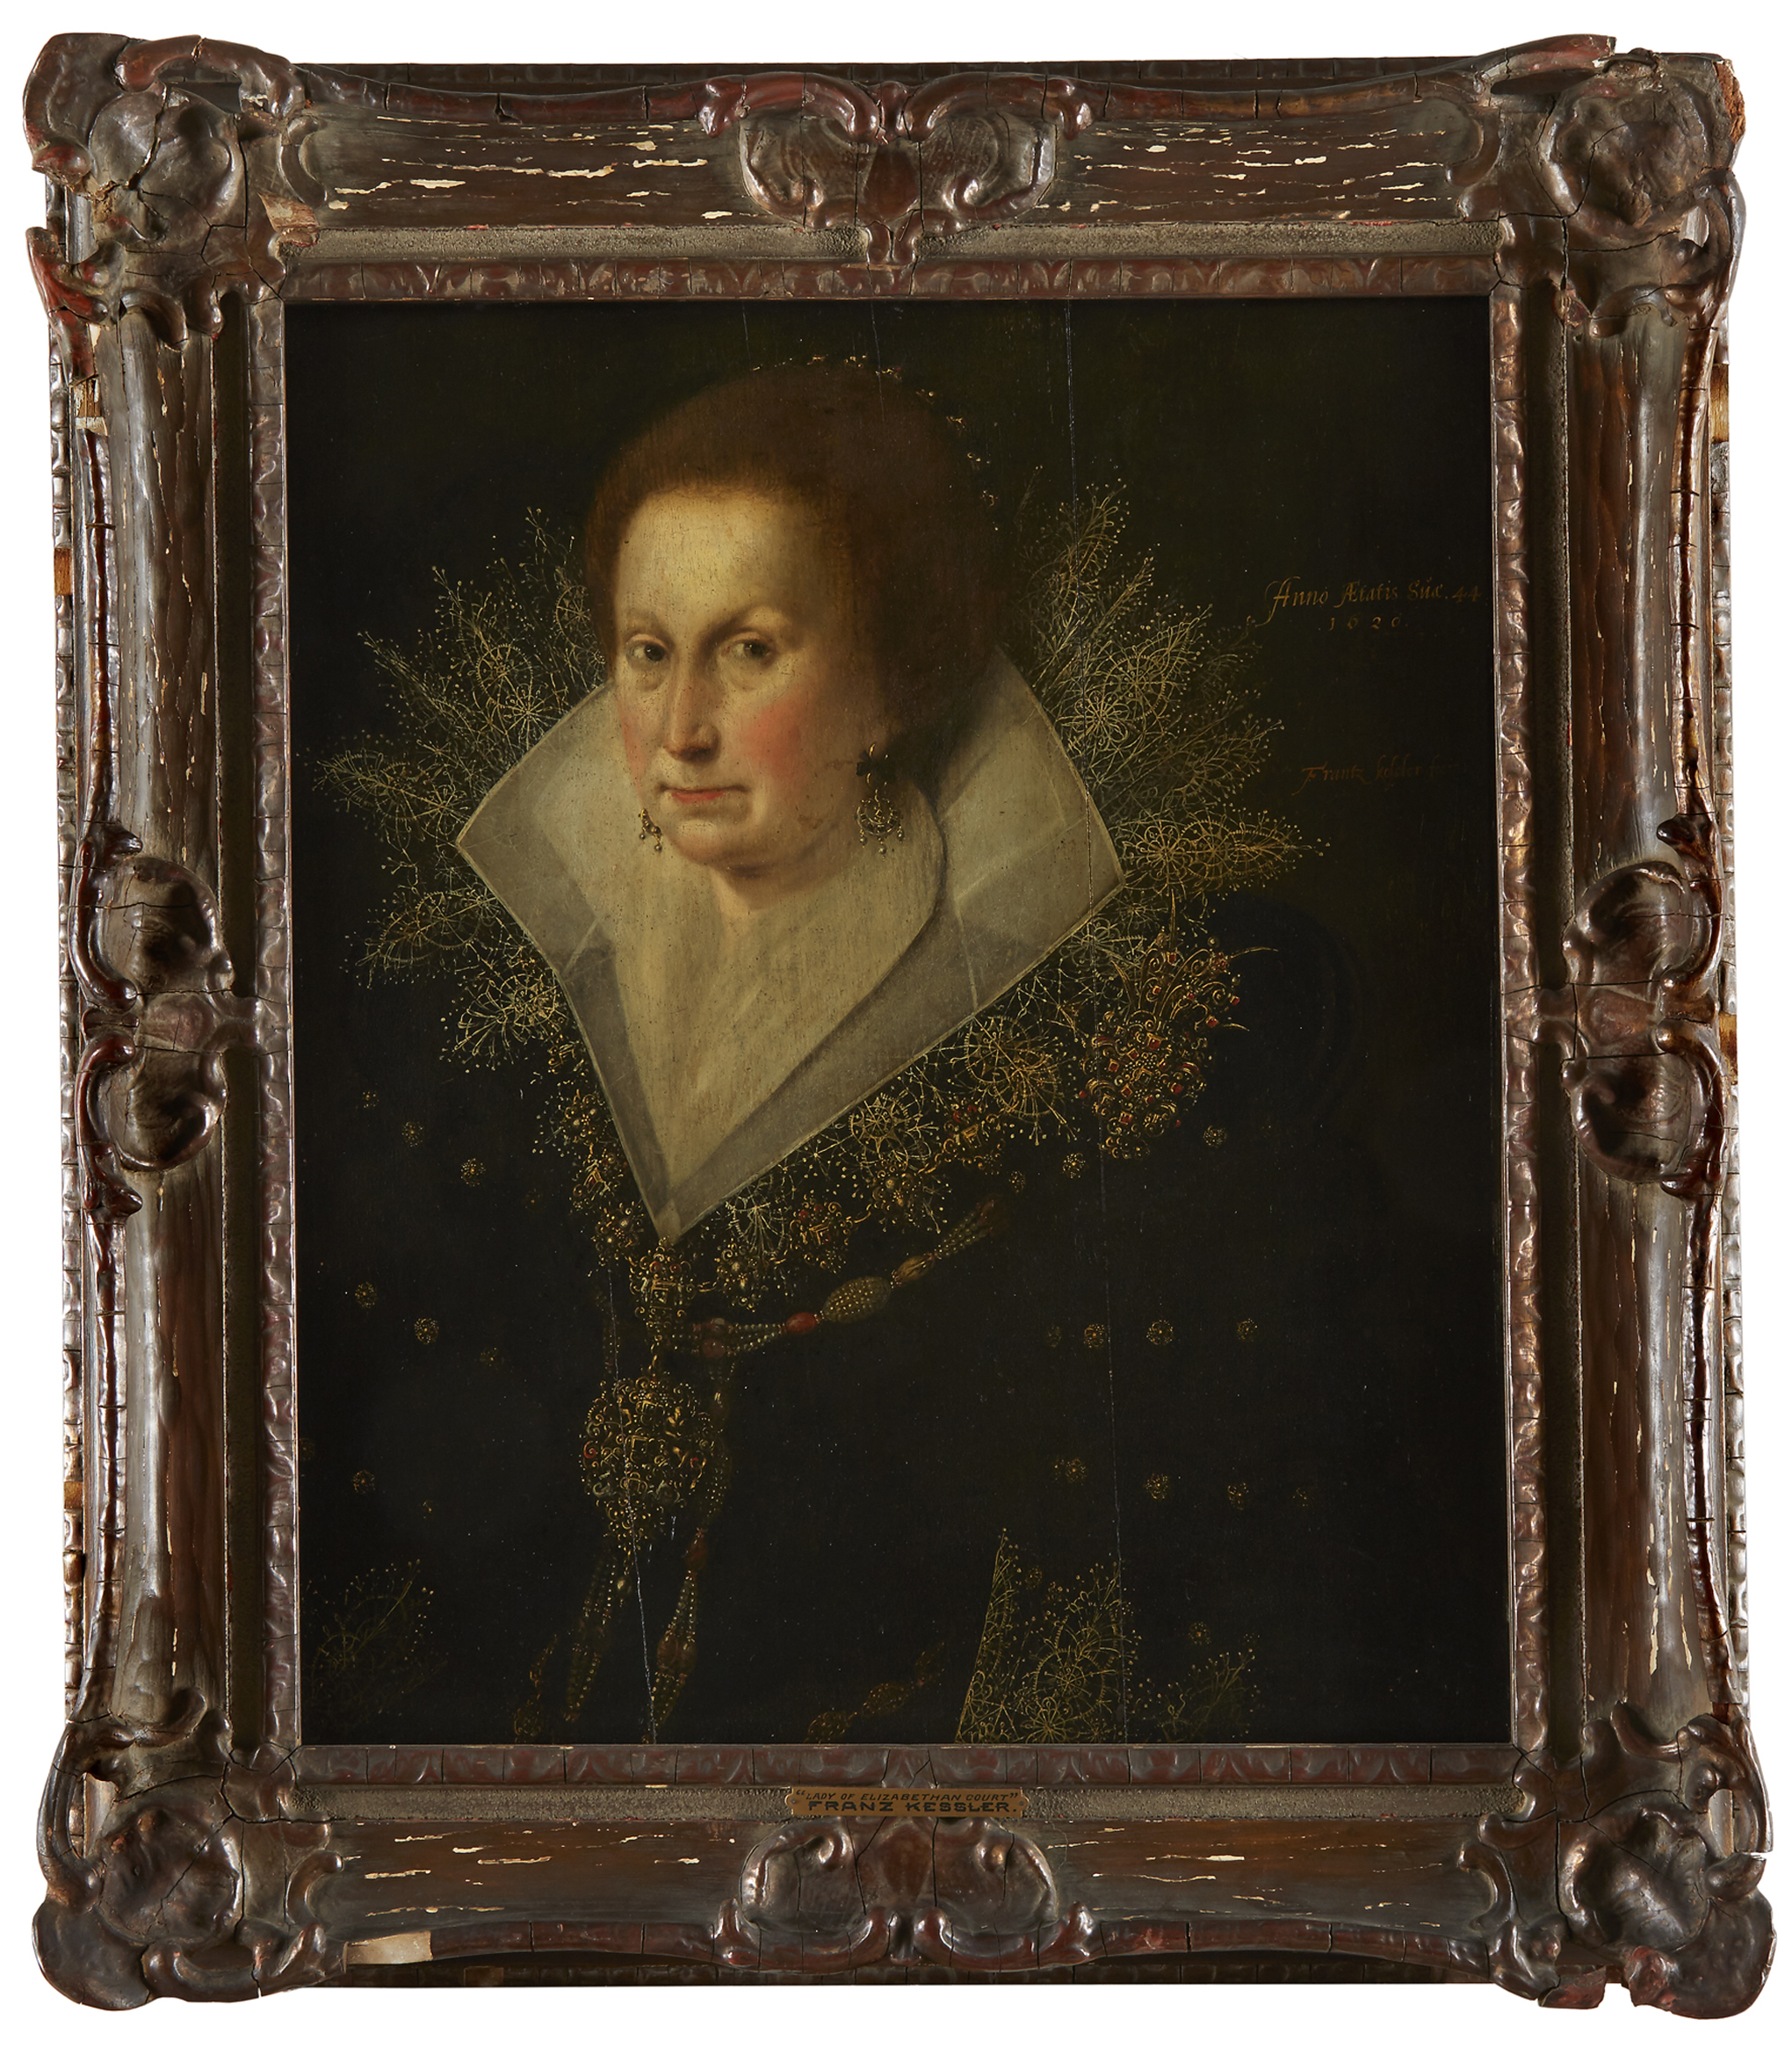 Lot 78: Franz Kessler (German 1580-c.1650), Portrait of a Lady, Bust-Length, Oil on Cradled Panel, $7,000-10,000, to be offered at Freeman's on 10 April 2019